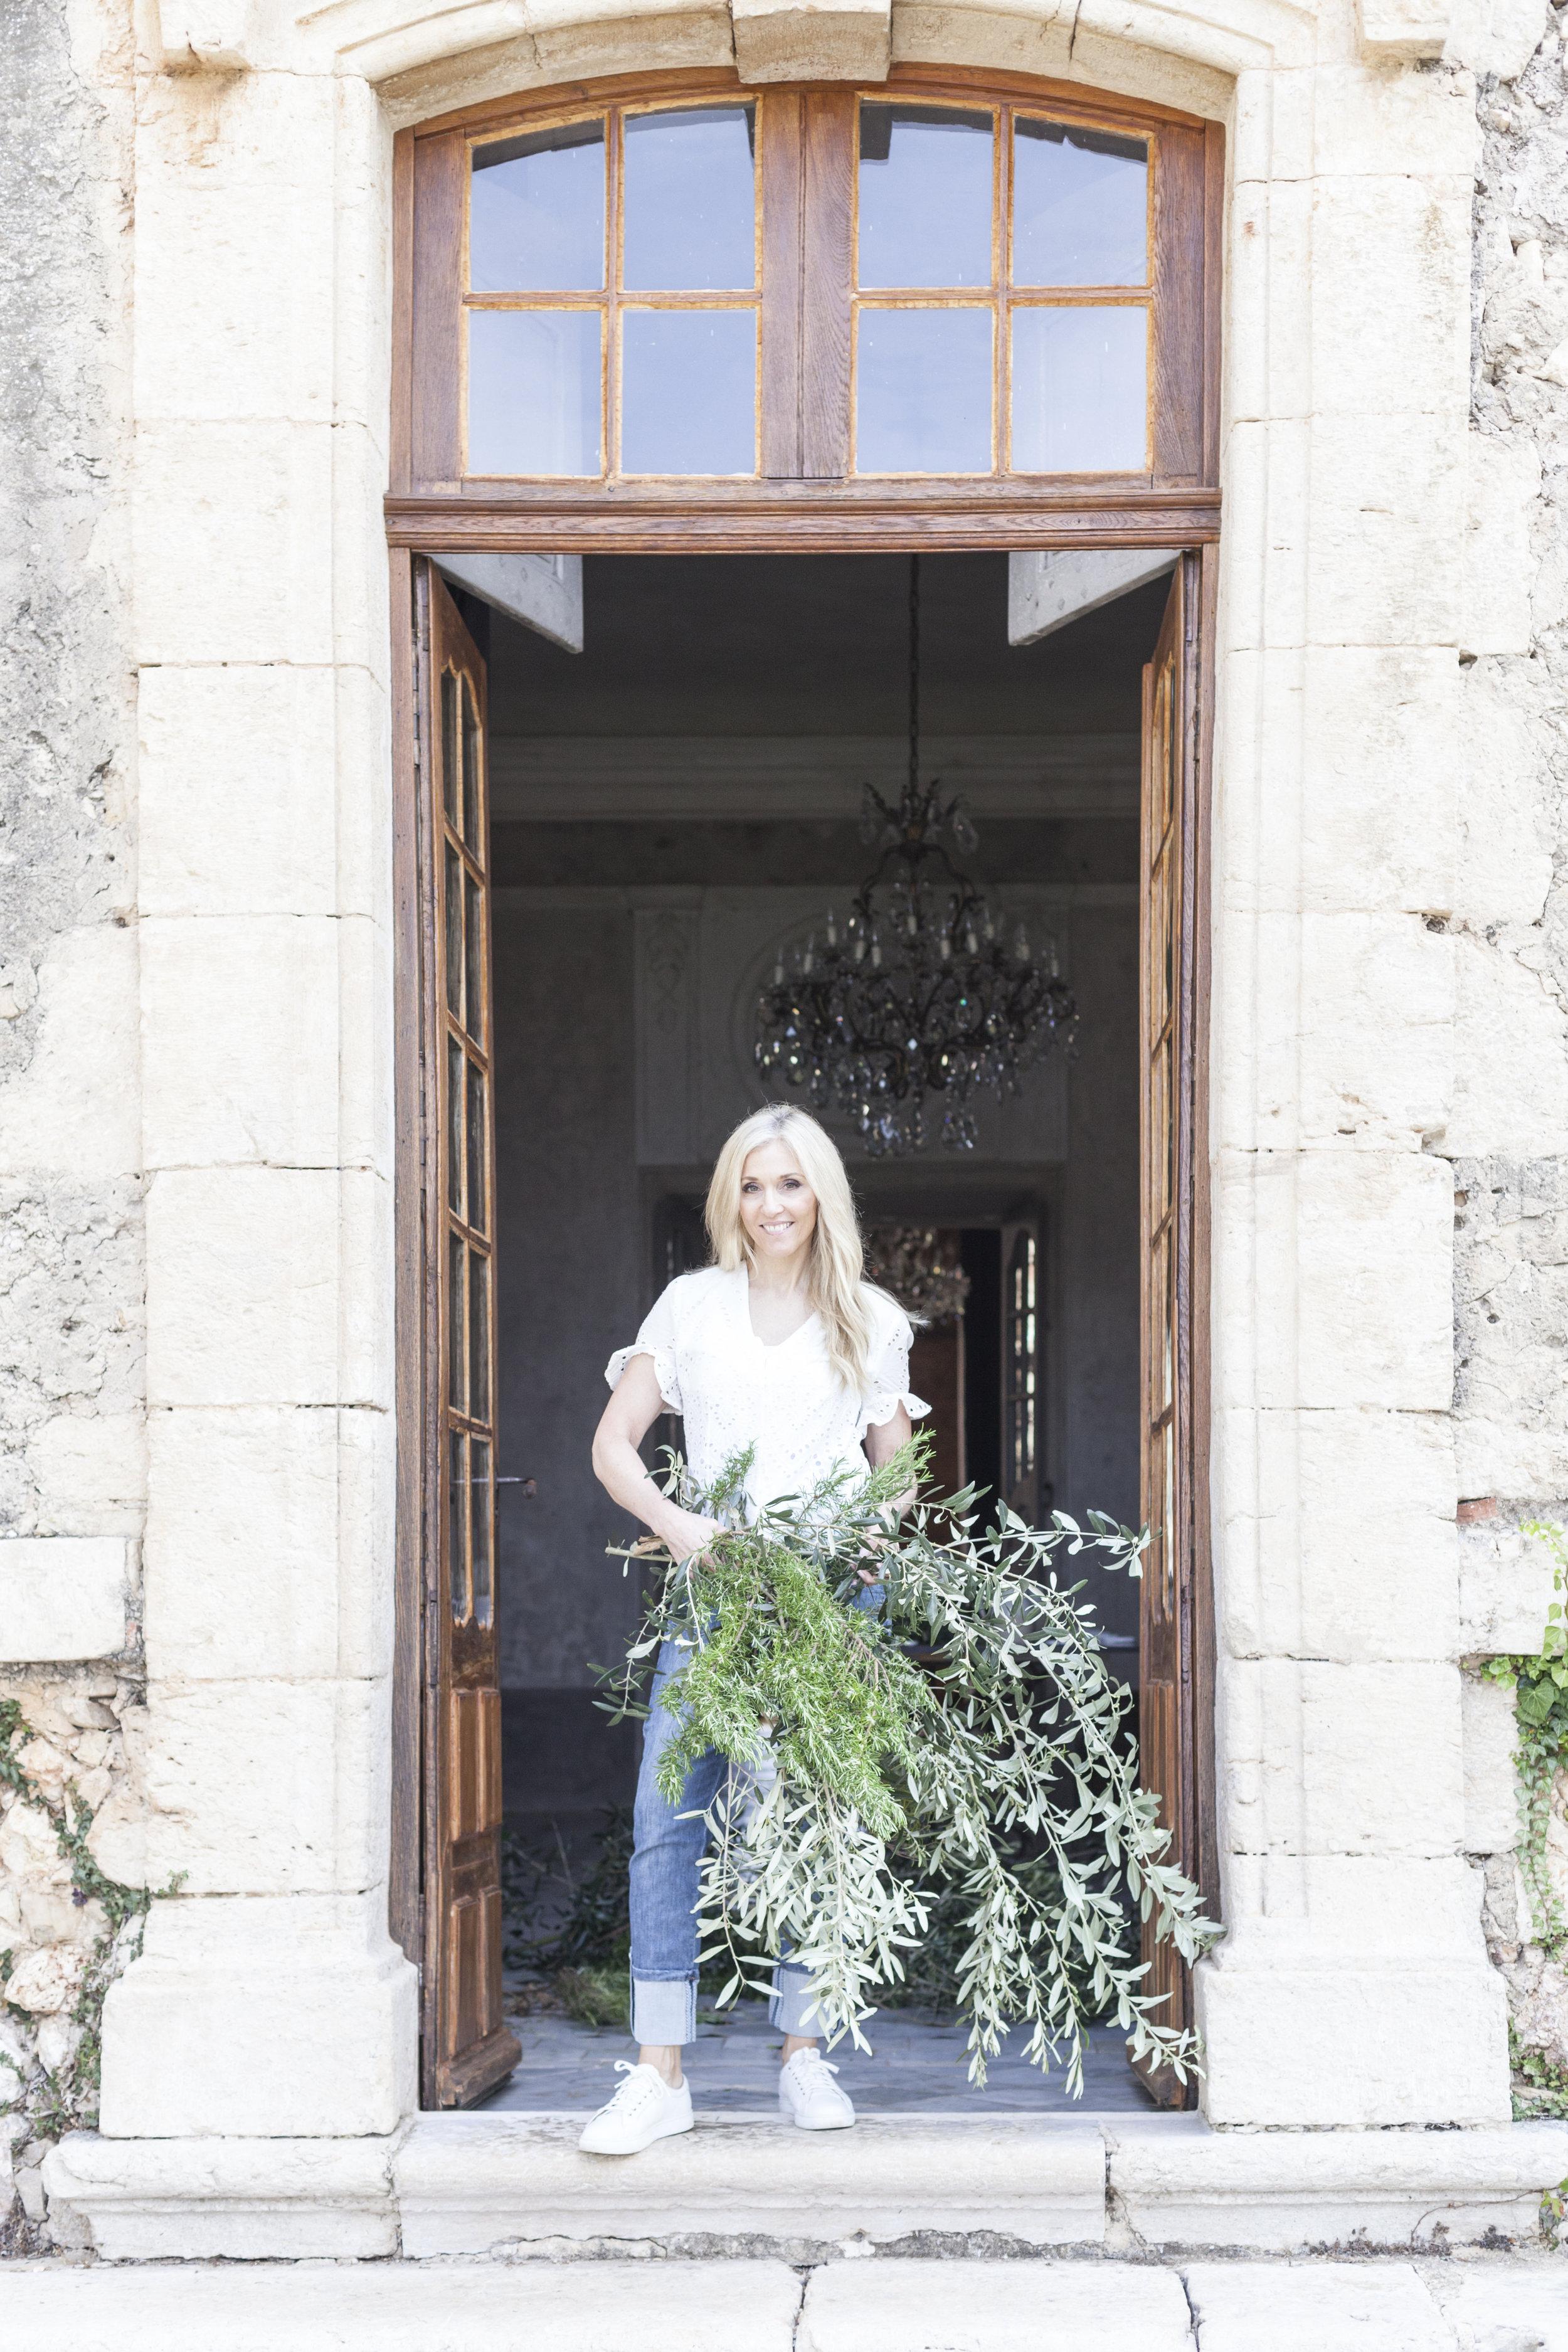 france-provence-floral-workshop-sandra-sigman-french-chatou.jpg